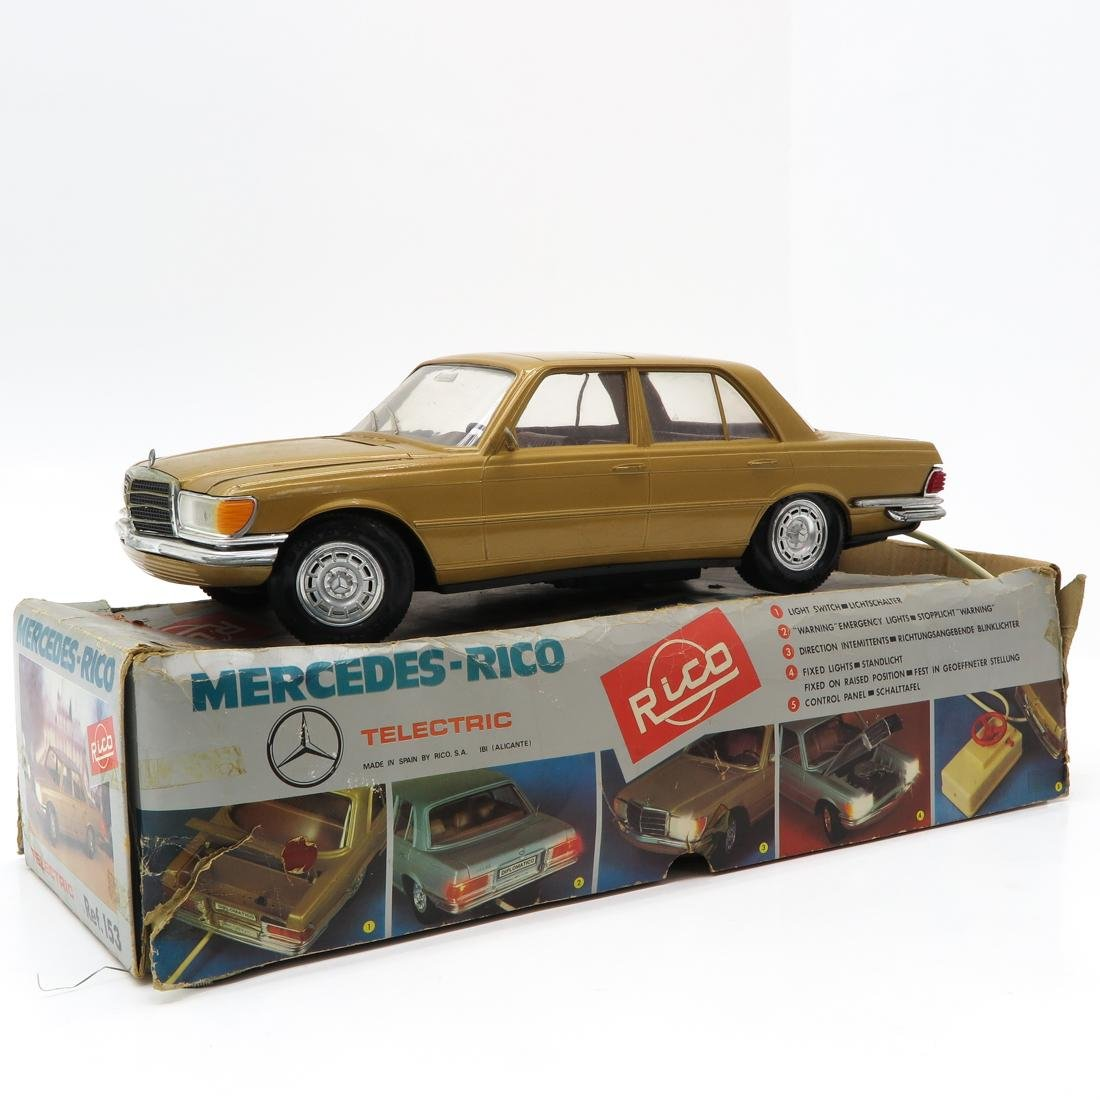 Vintage Rico Mercedes Benz Toy Car in Box - 2